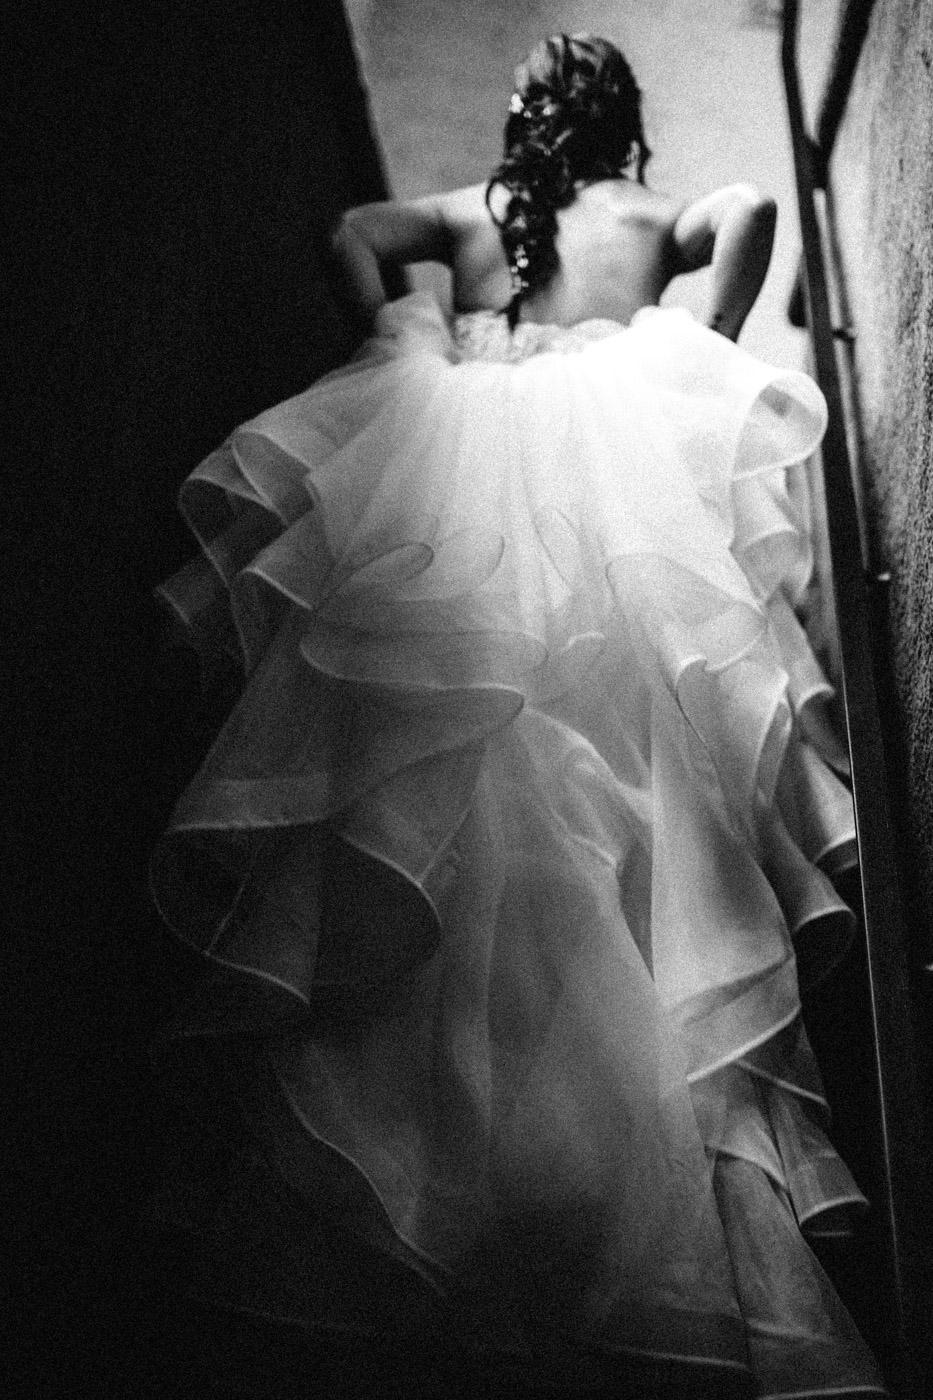 toronto_wedding_photographer_best_wedding_photography-4.jpg